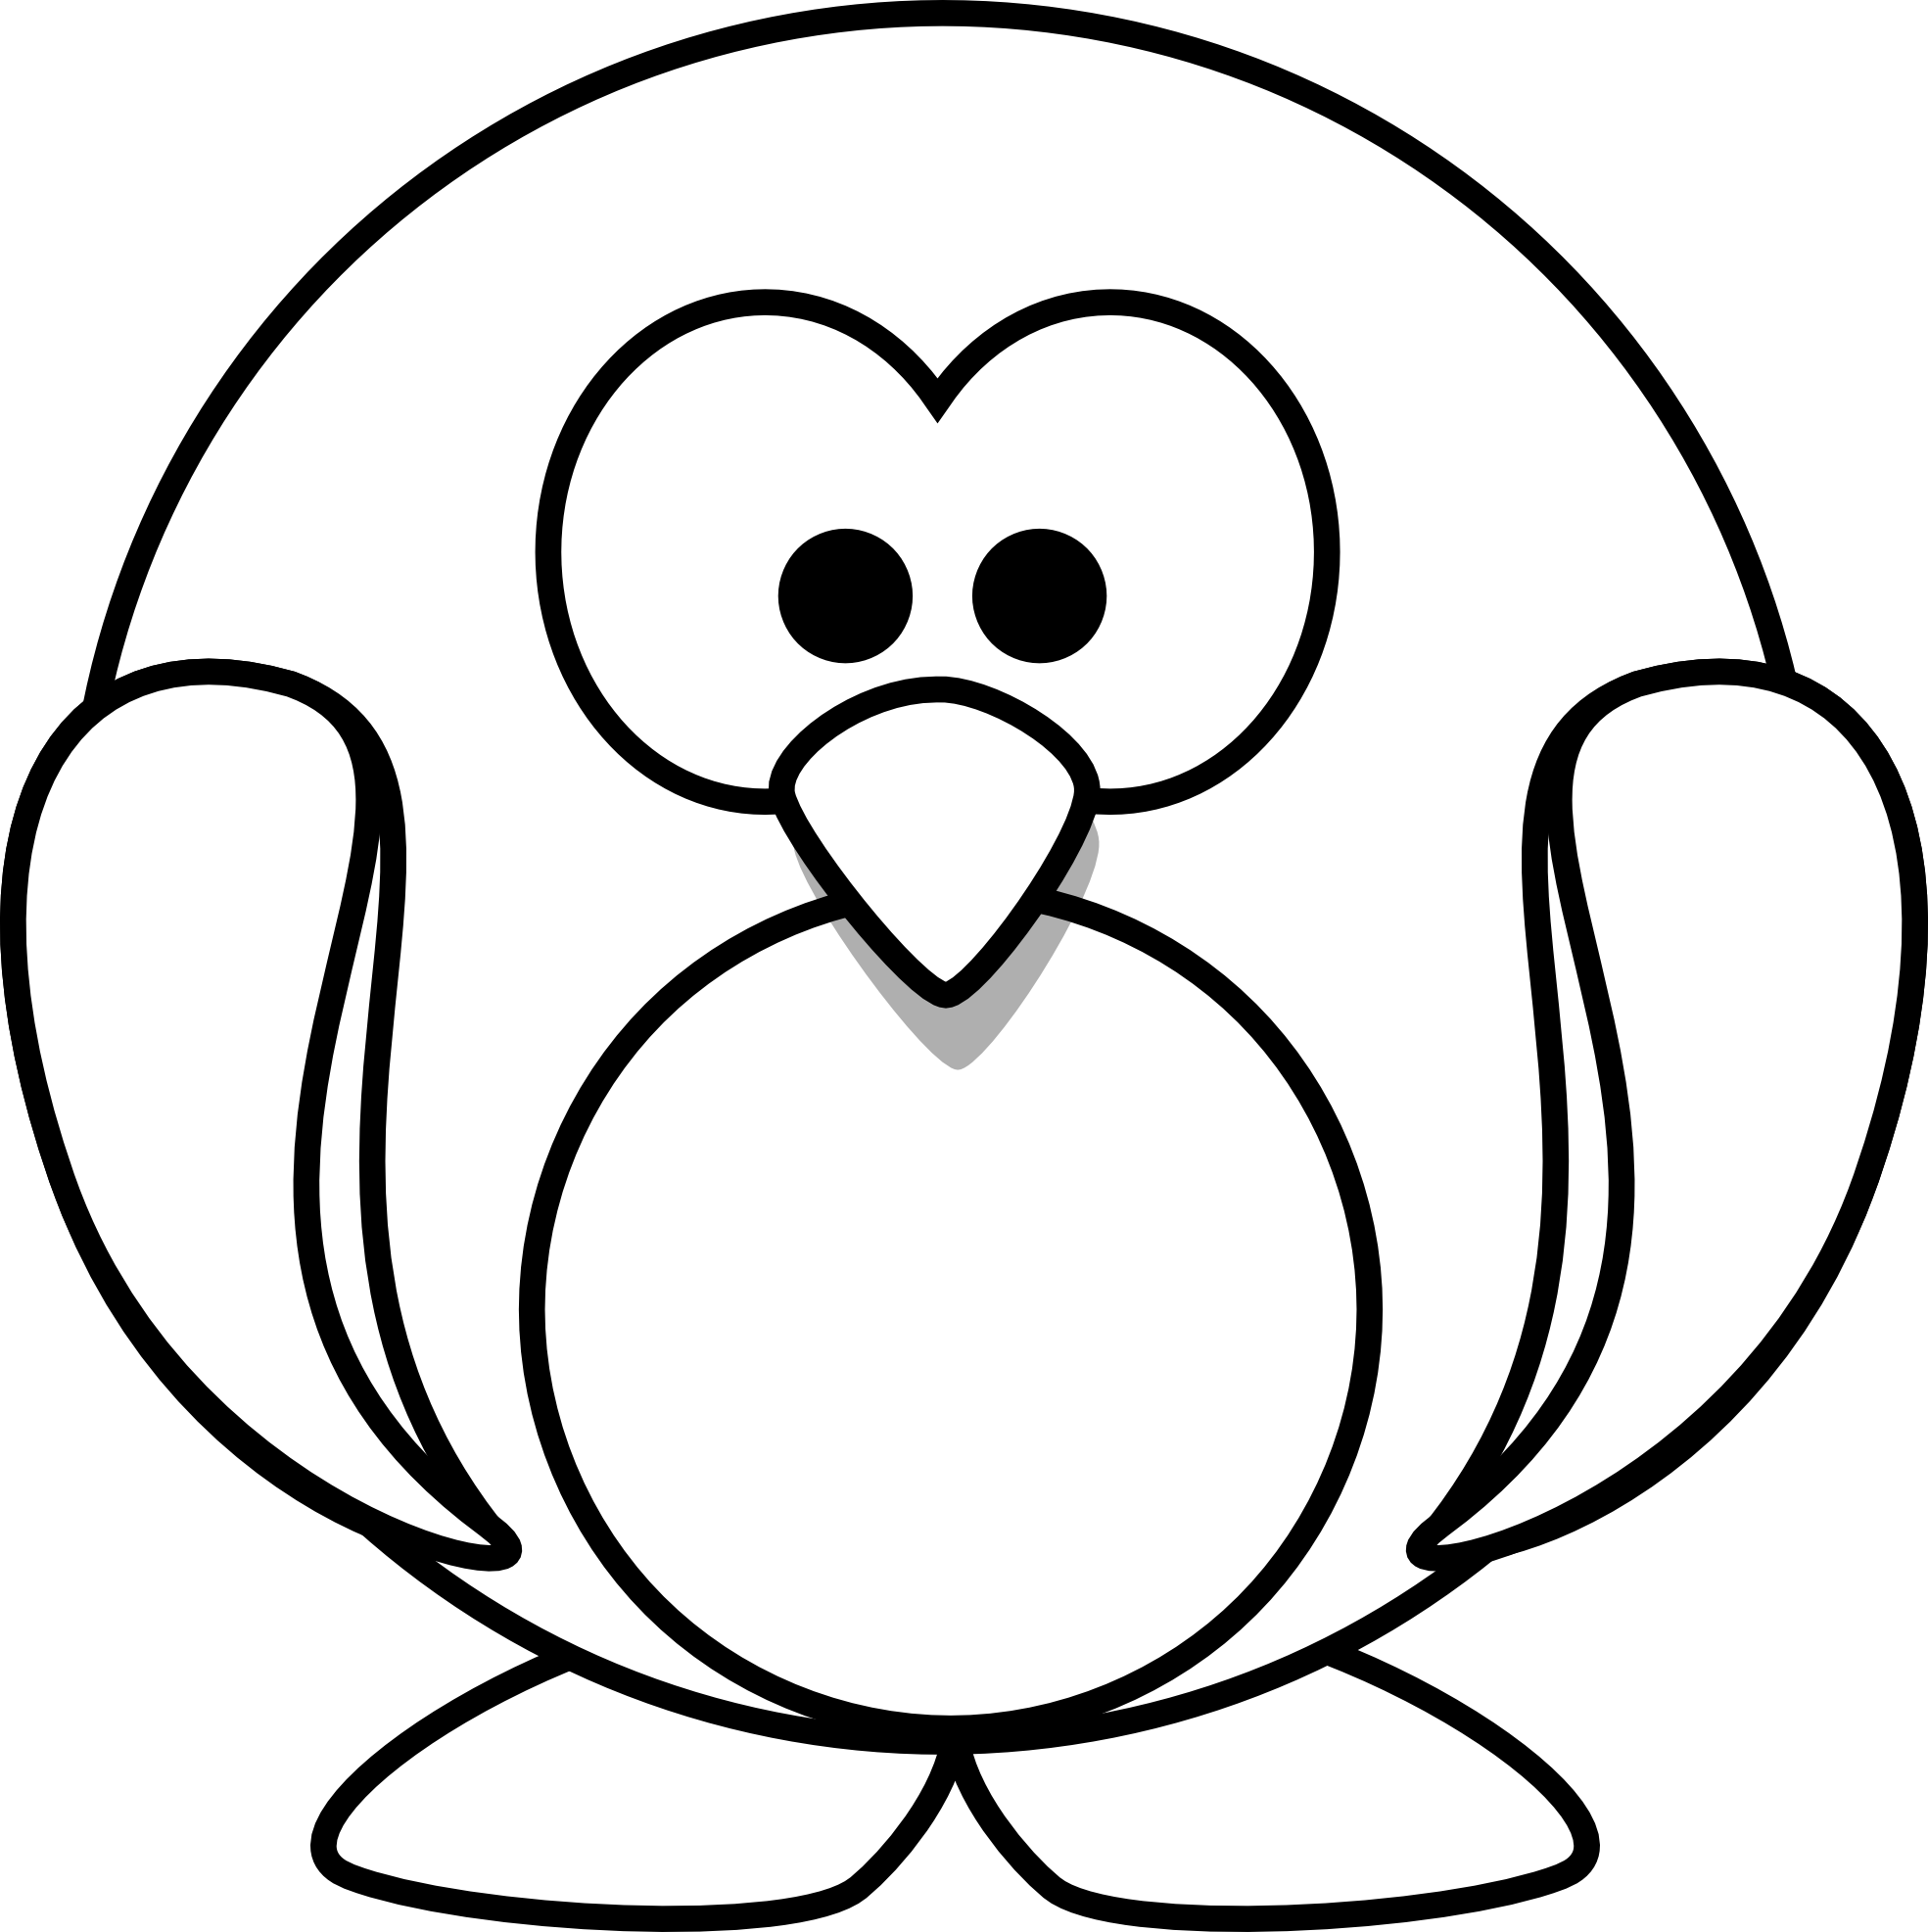 penguin 1 black white line clipart panda free clipart images